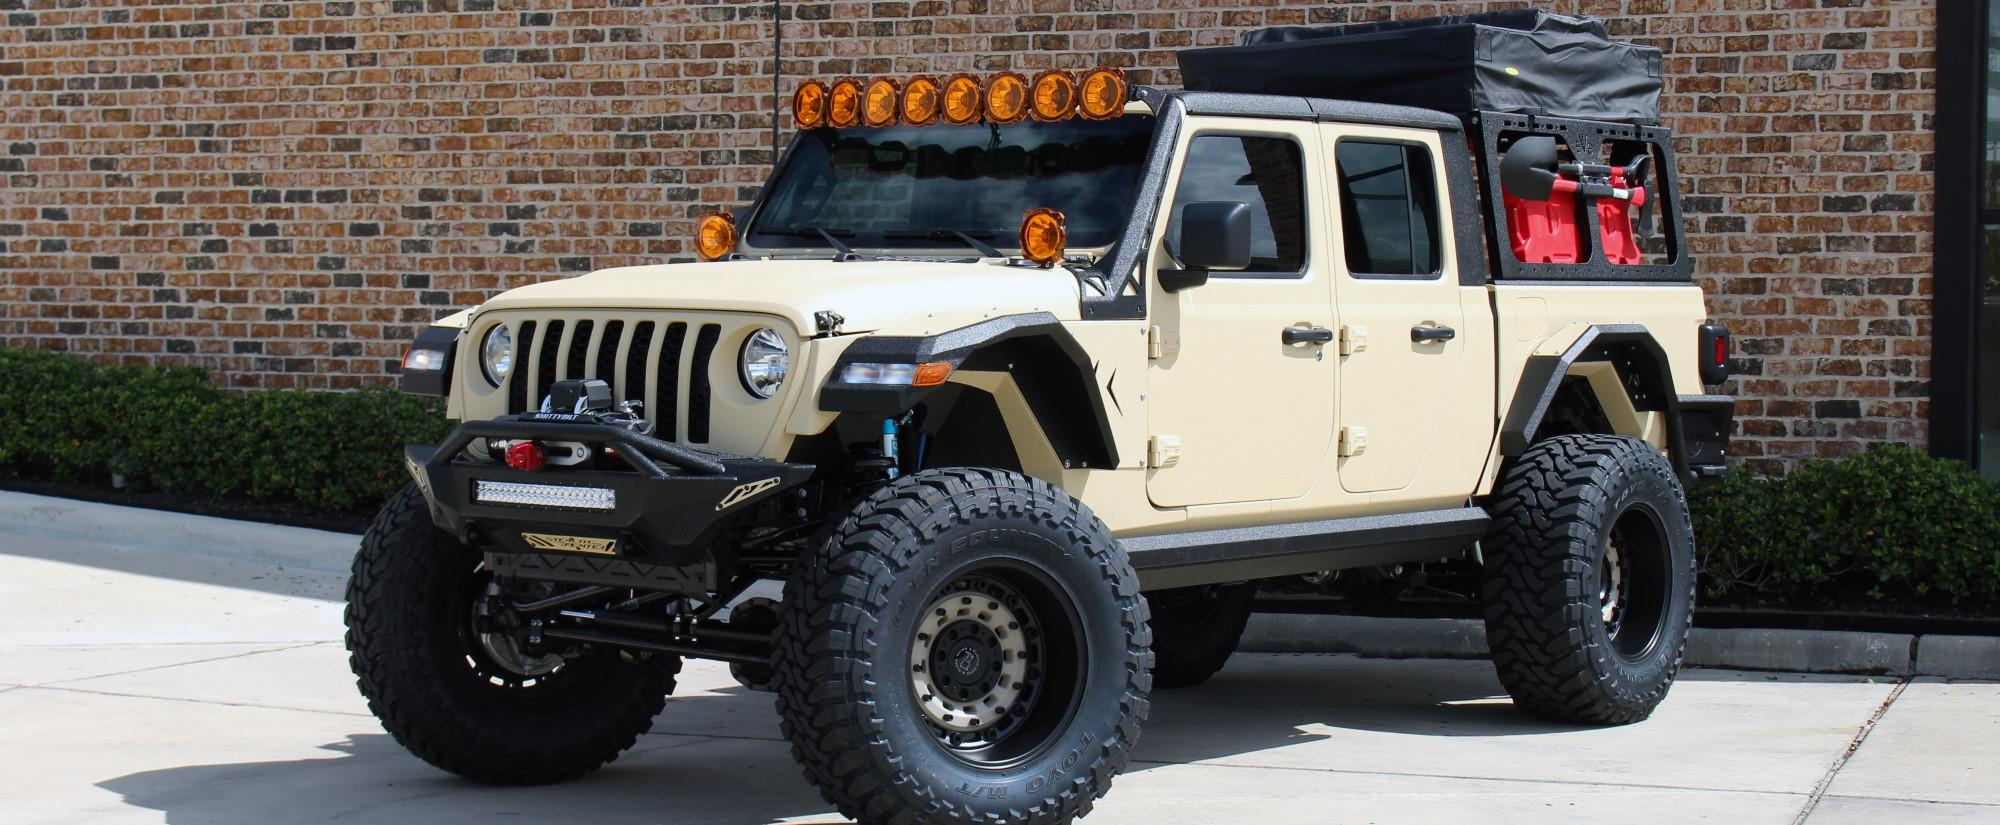 2020 Jeep Gladiator JT kevlar